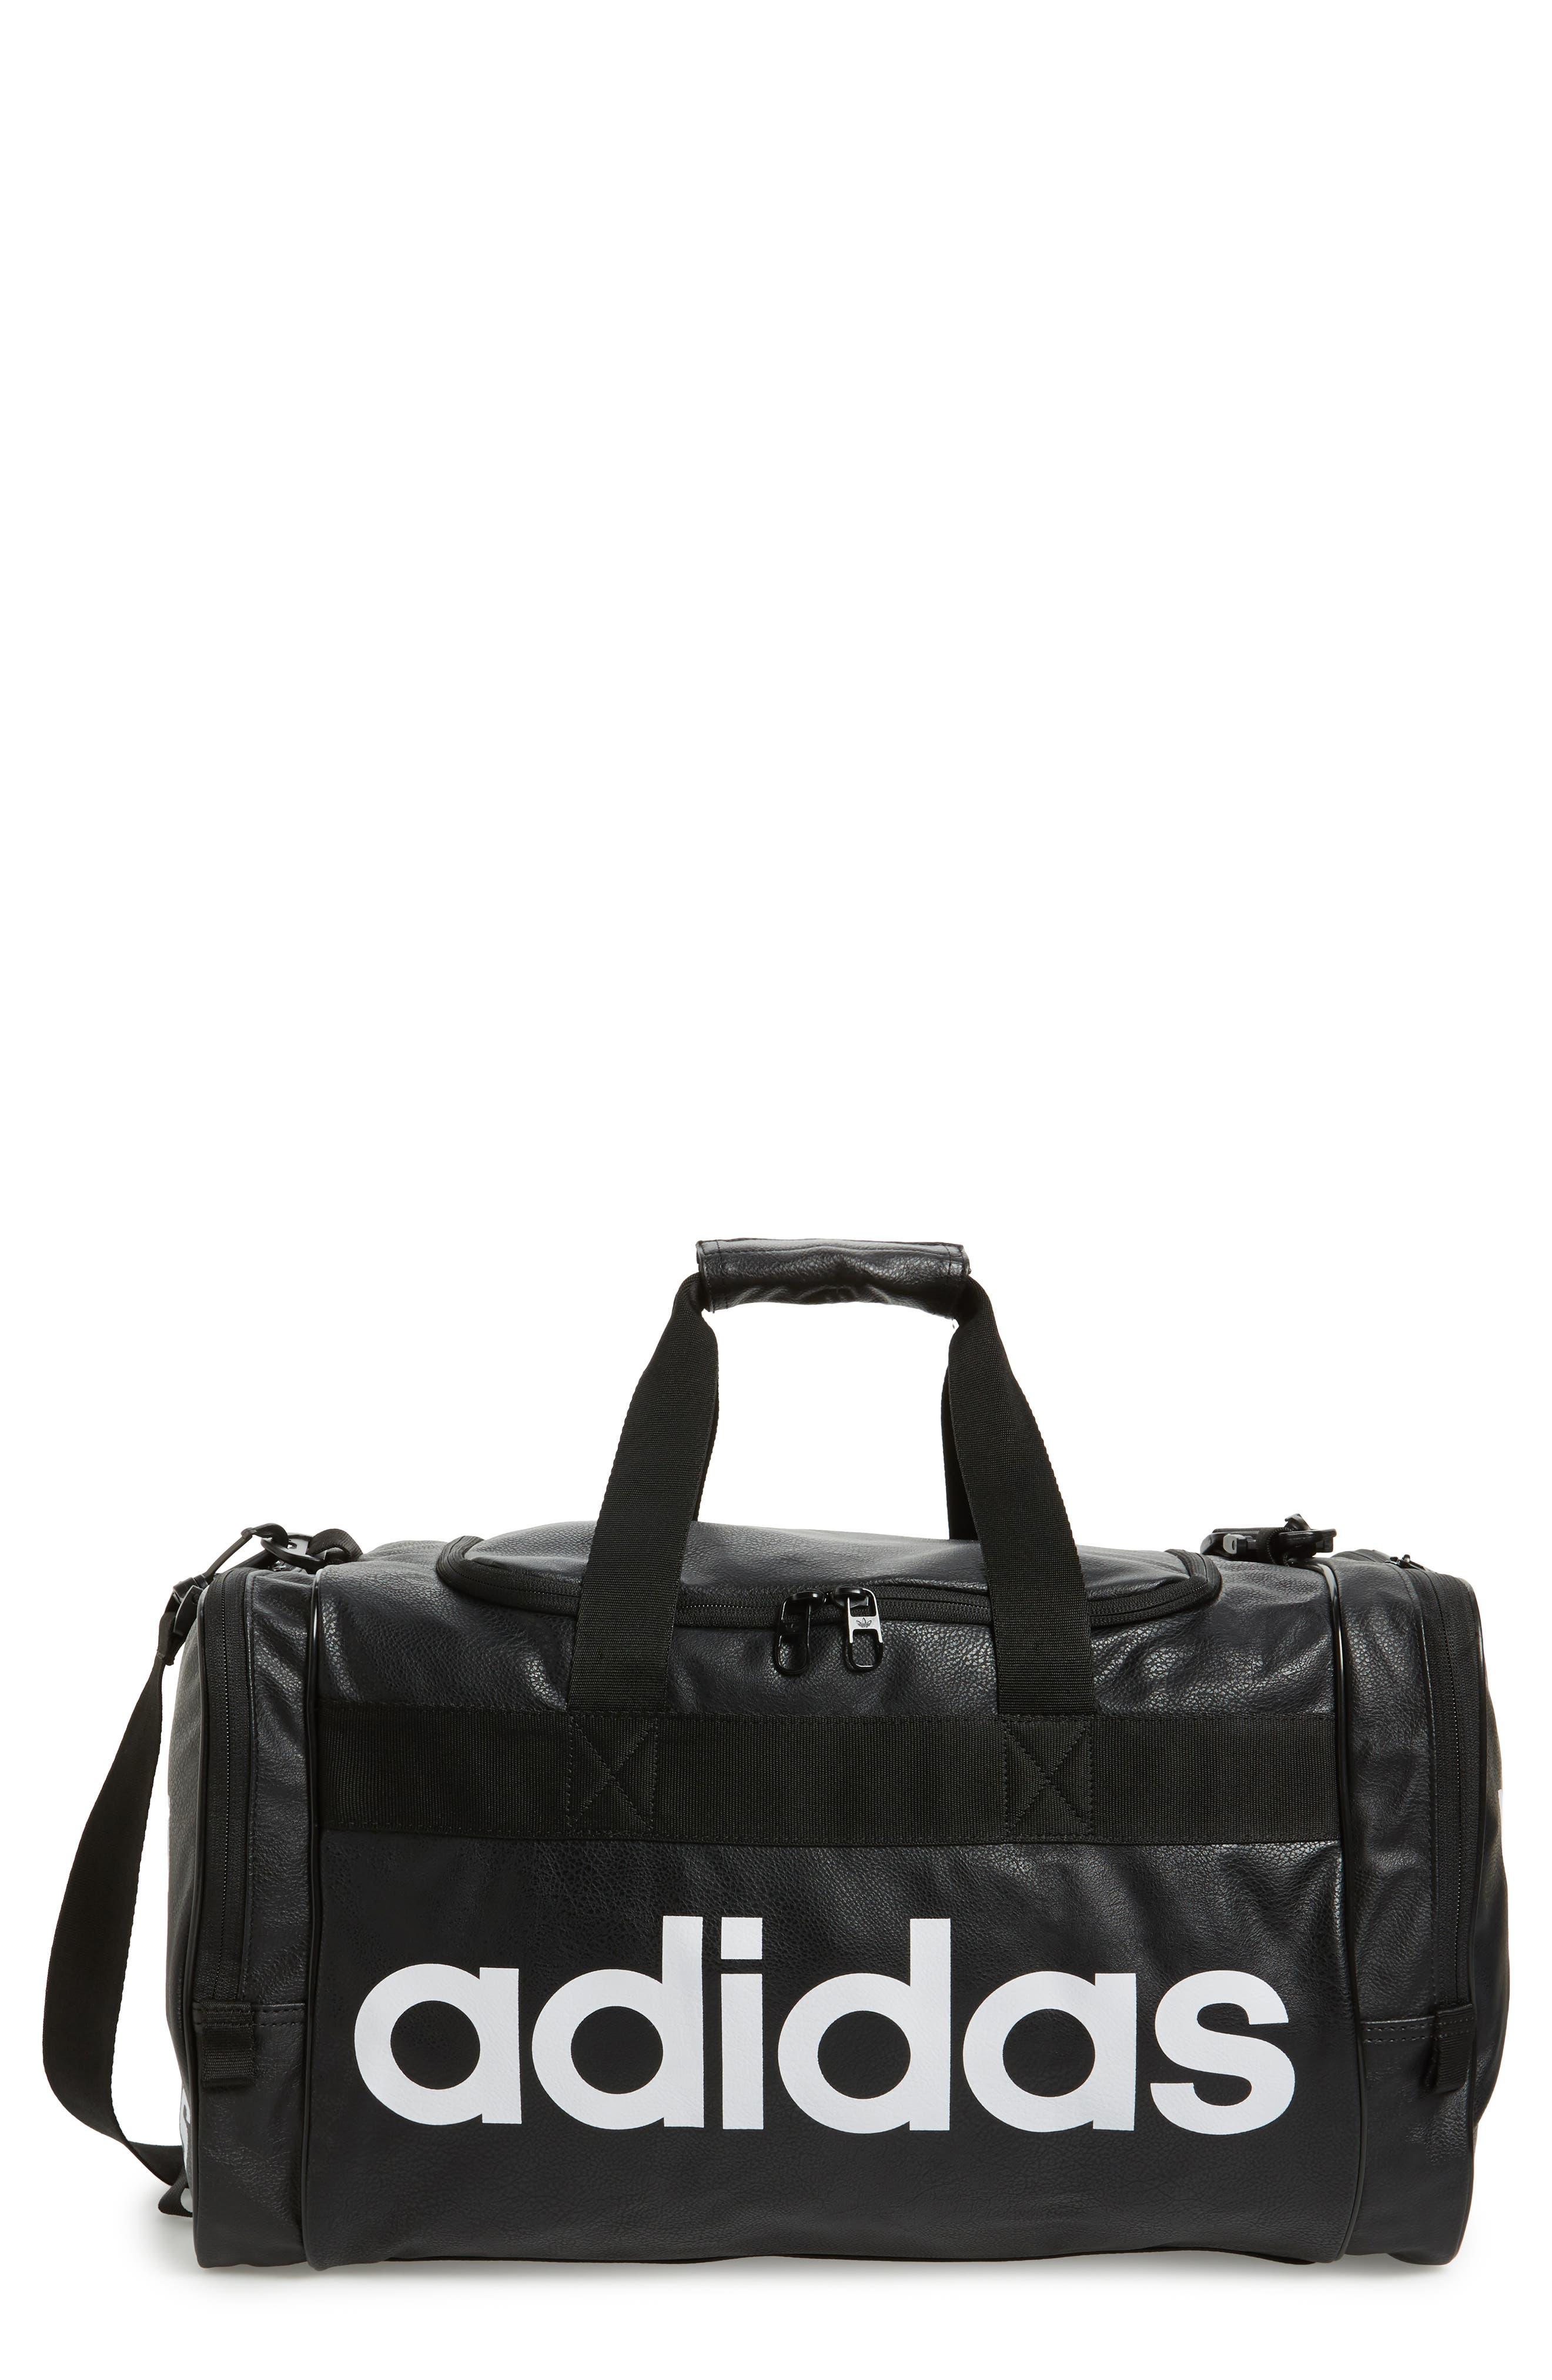 ADIDAS ORIGINALS, Santiago Duffle Bag, Main thumbnail 1, color, BLACK/ CHALK WHITE